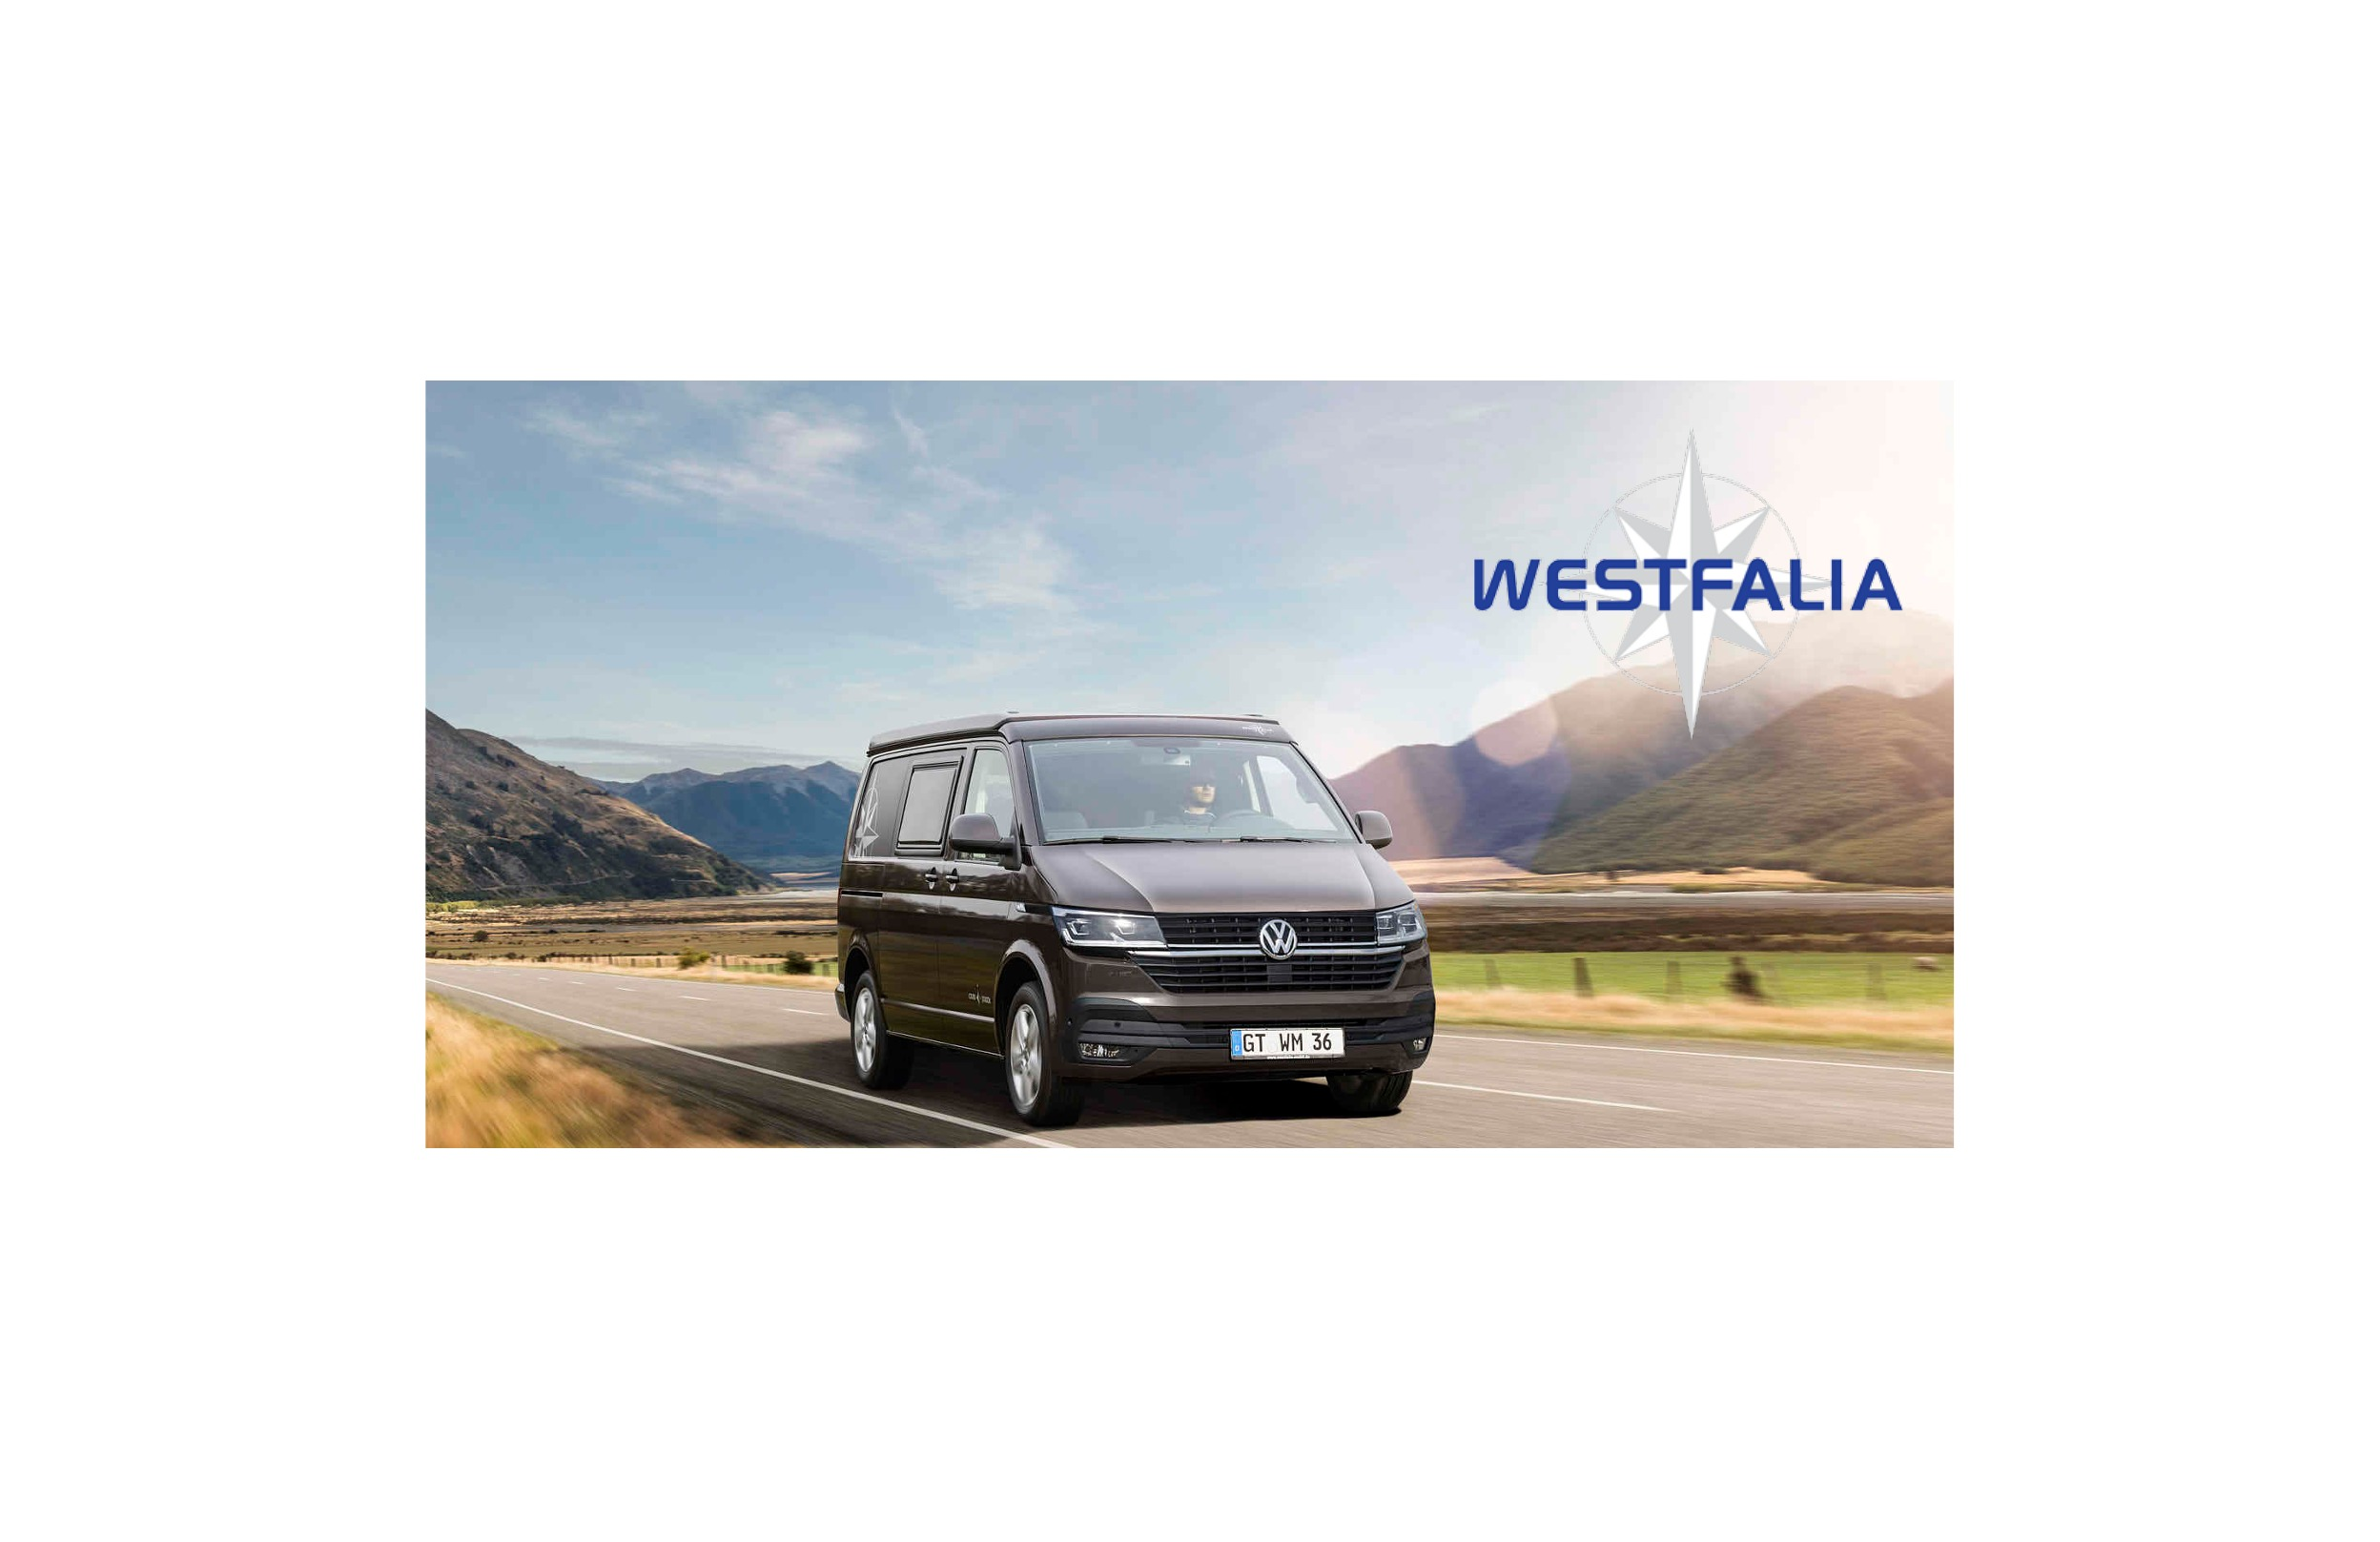 Wandahome Extends Their Range of Westfalia Campervans